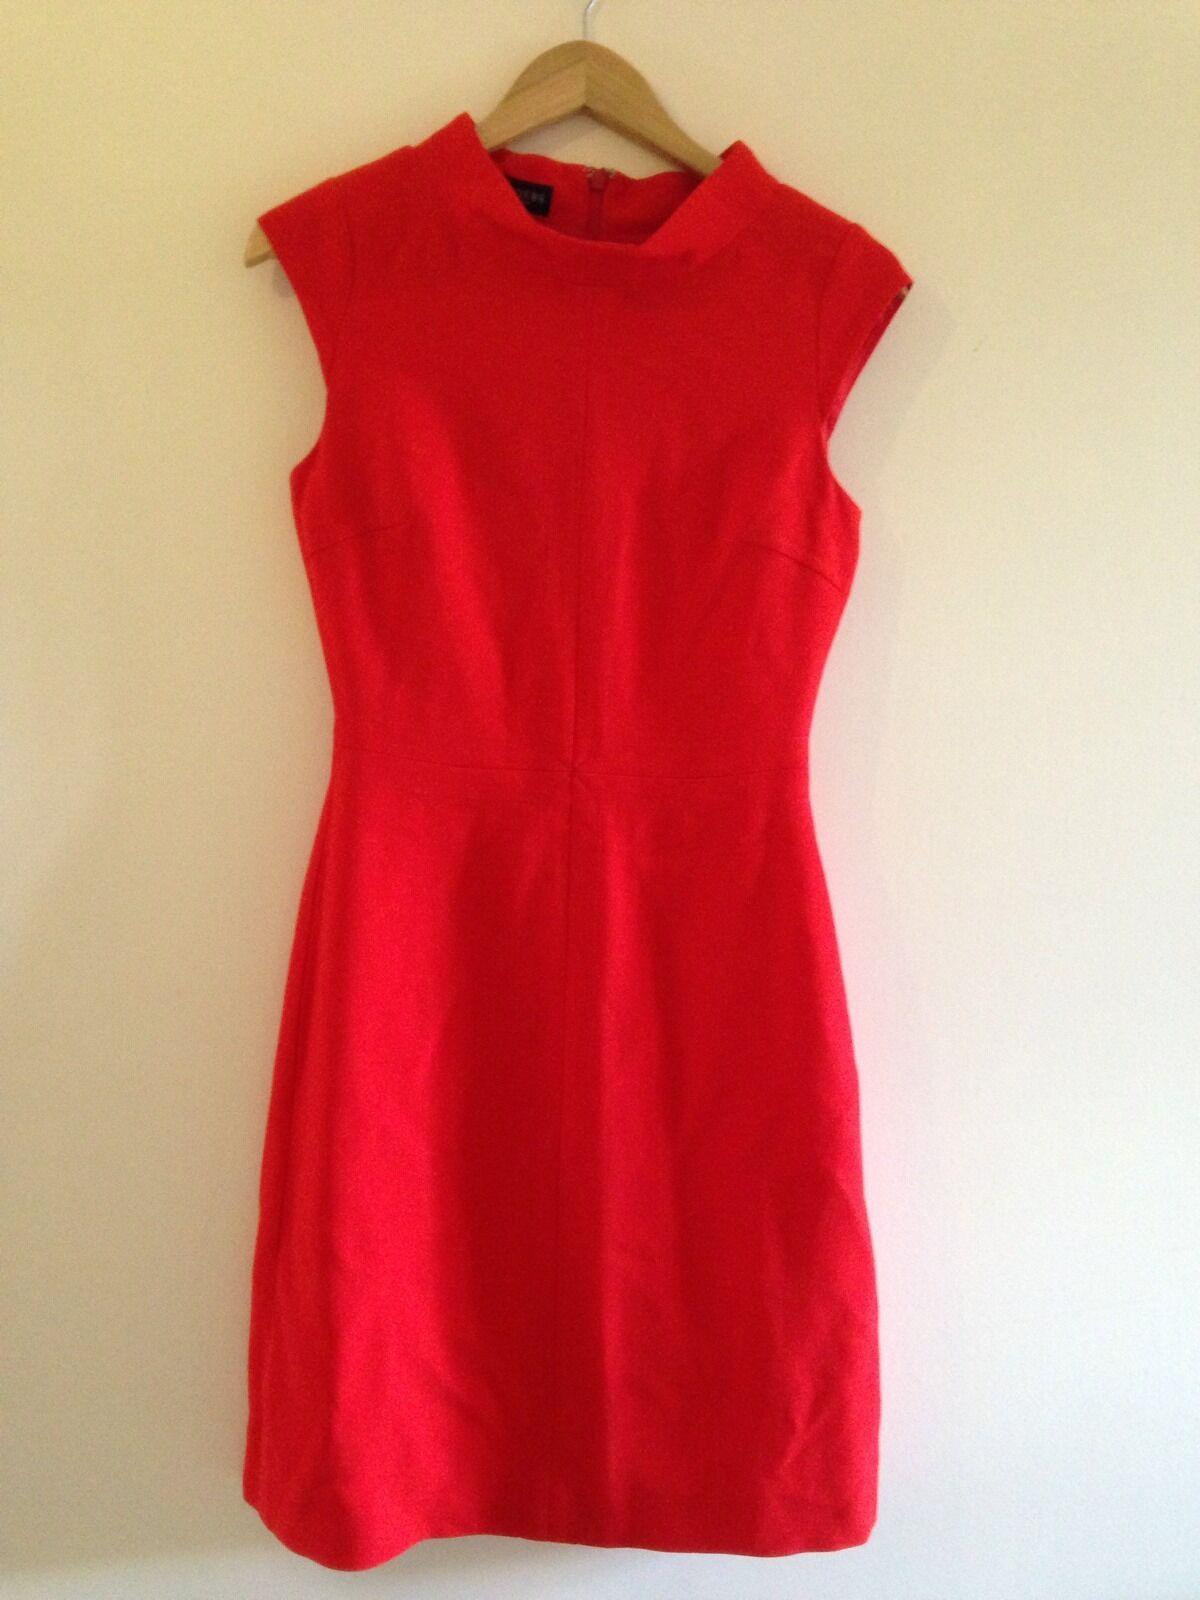 Hobbs RUBENS Flame Red dress - UK size 8